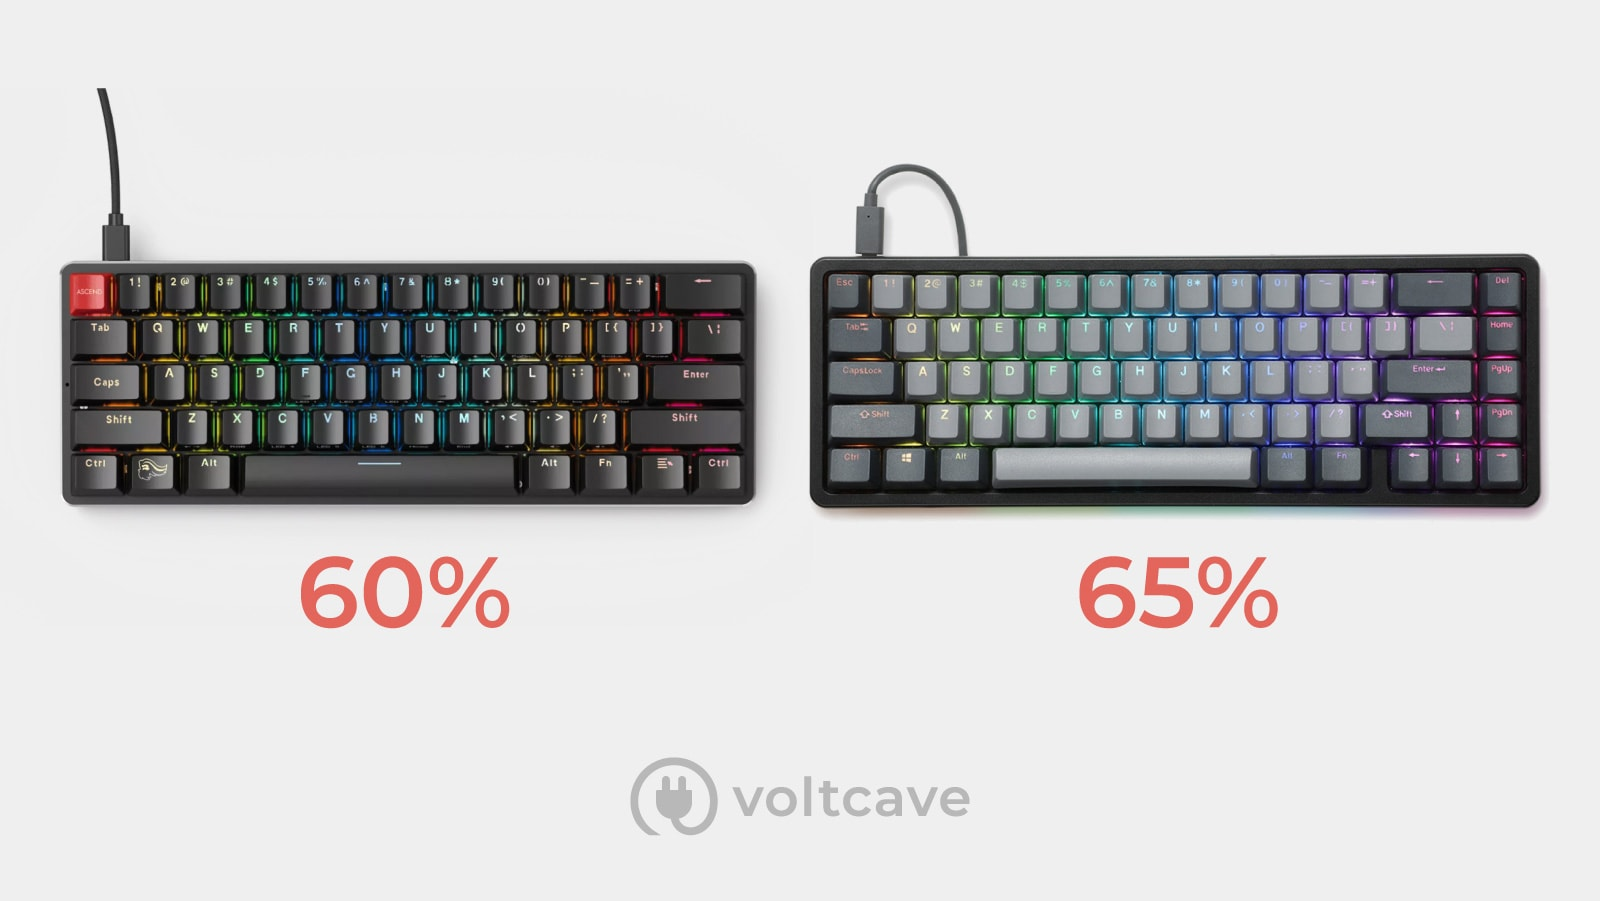 60% vs. 65% keyboard layouts